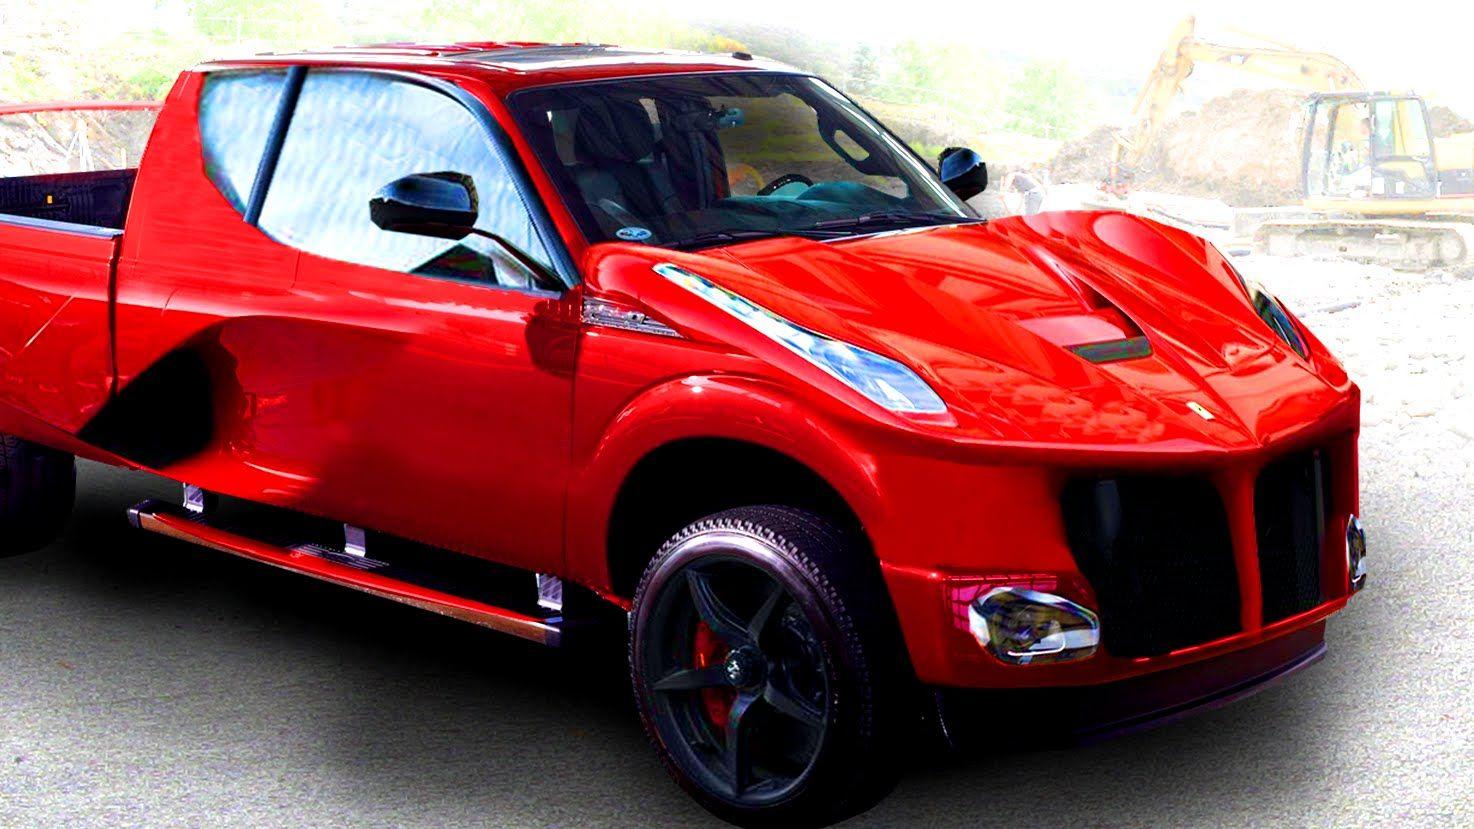 Ferrari Concept Truck Someones Horrible Vision Custom Cars For Sale Ferrari Custom Cars